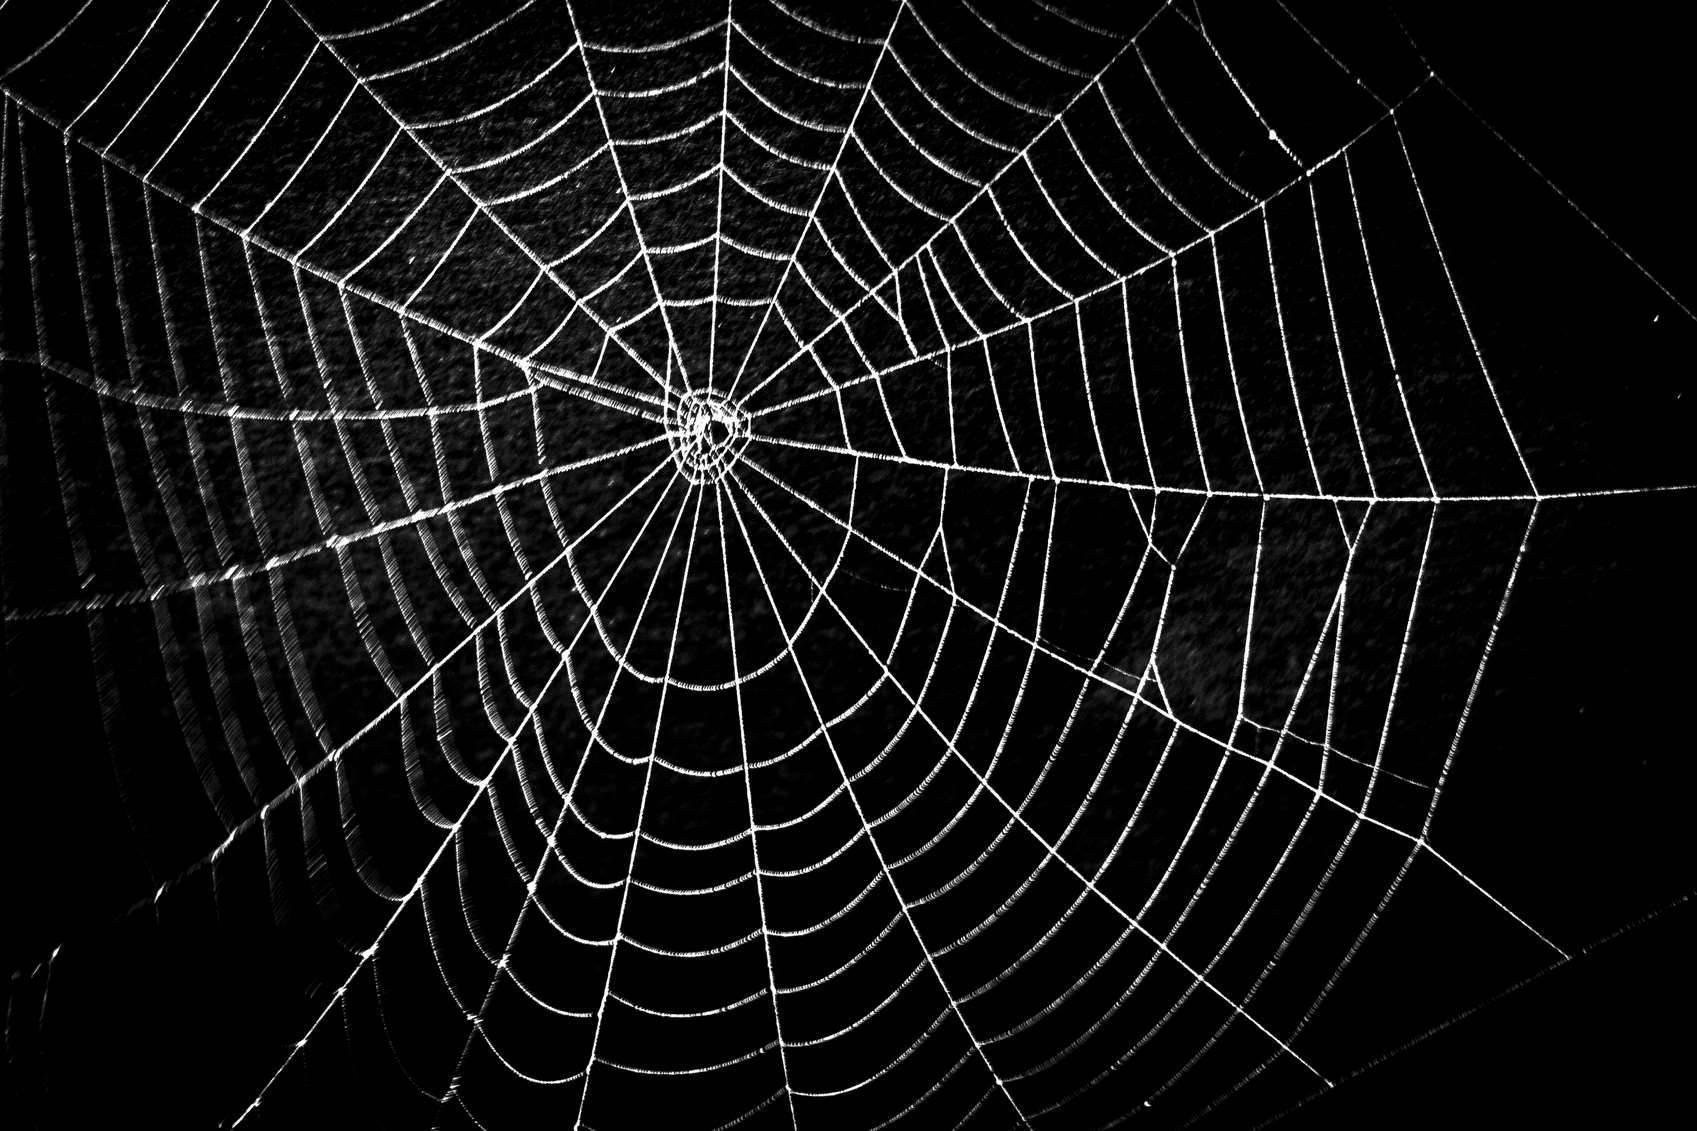 Energy Australia 39 S 39 Spiderweb 39 Systems Problem Software